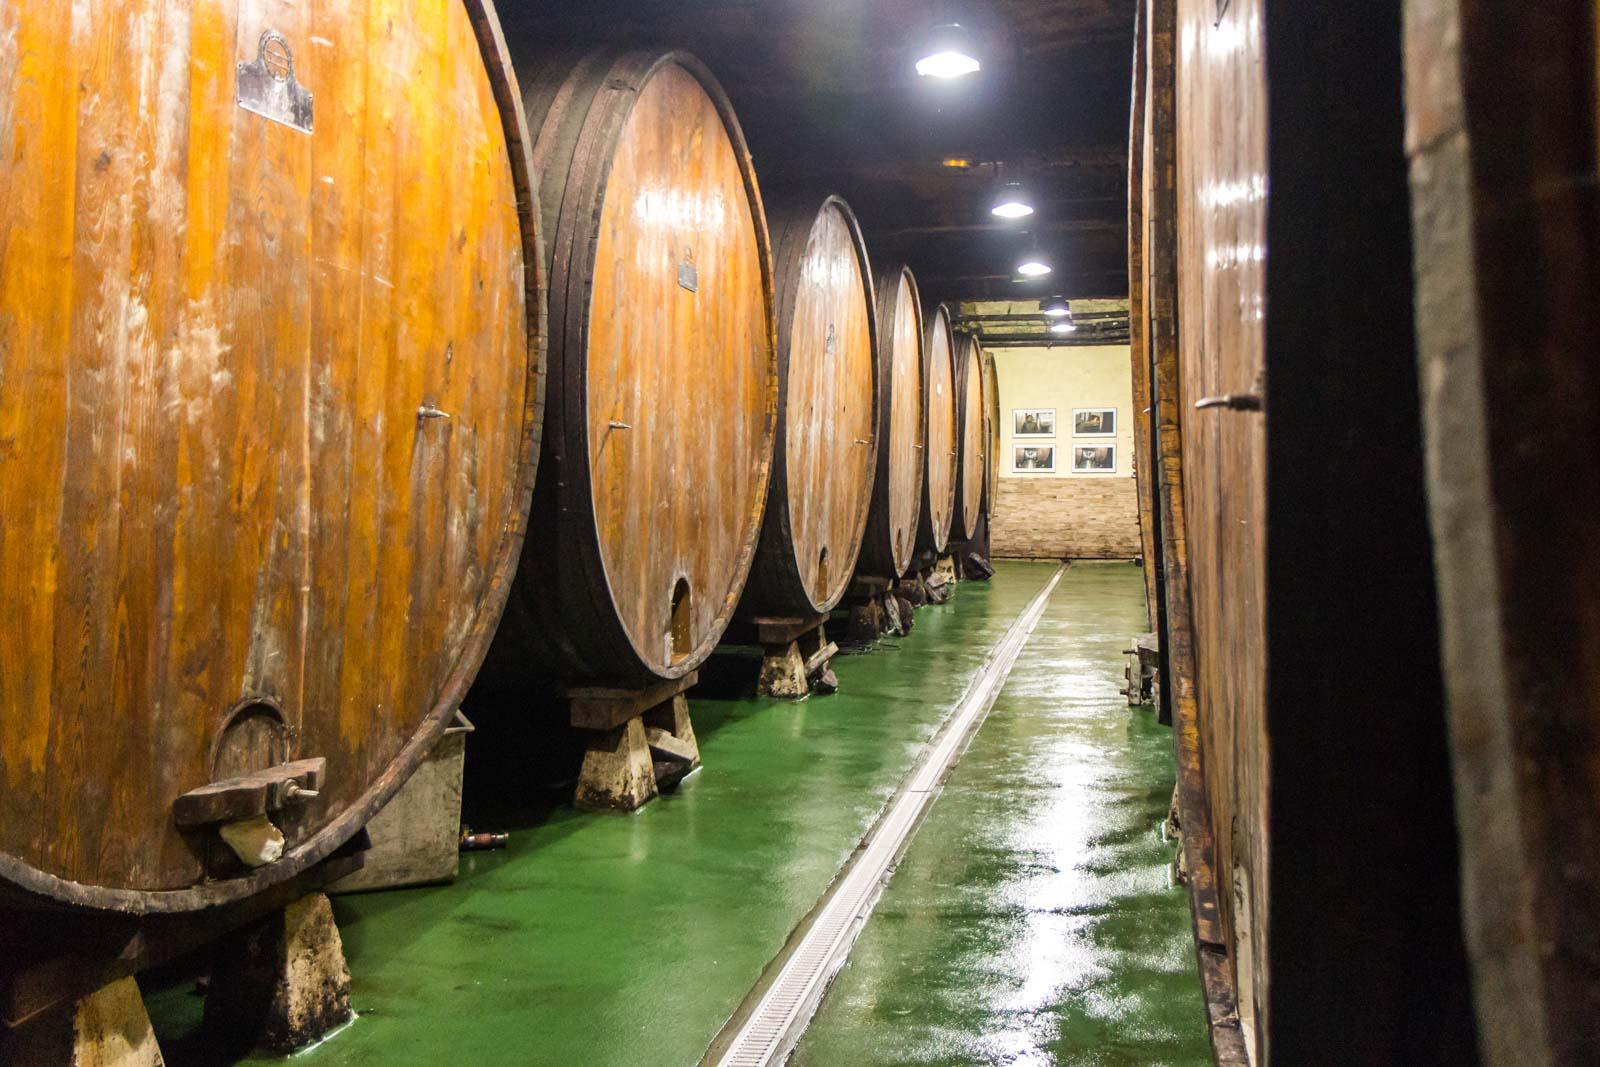 Cider houses, San Sebastian, Spain